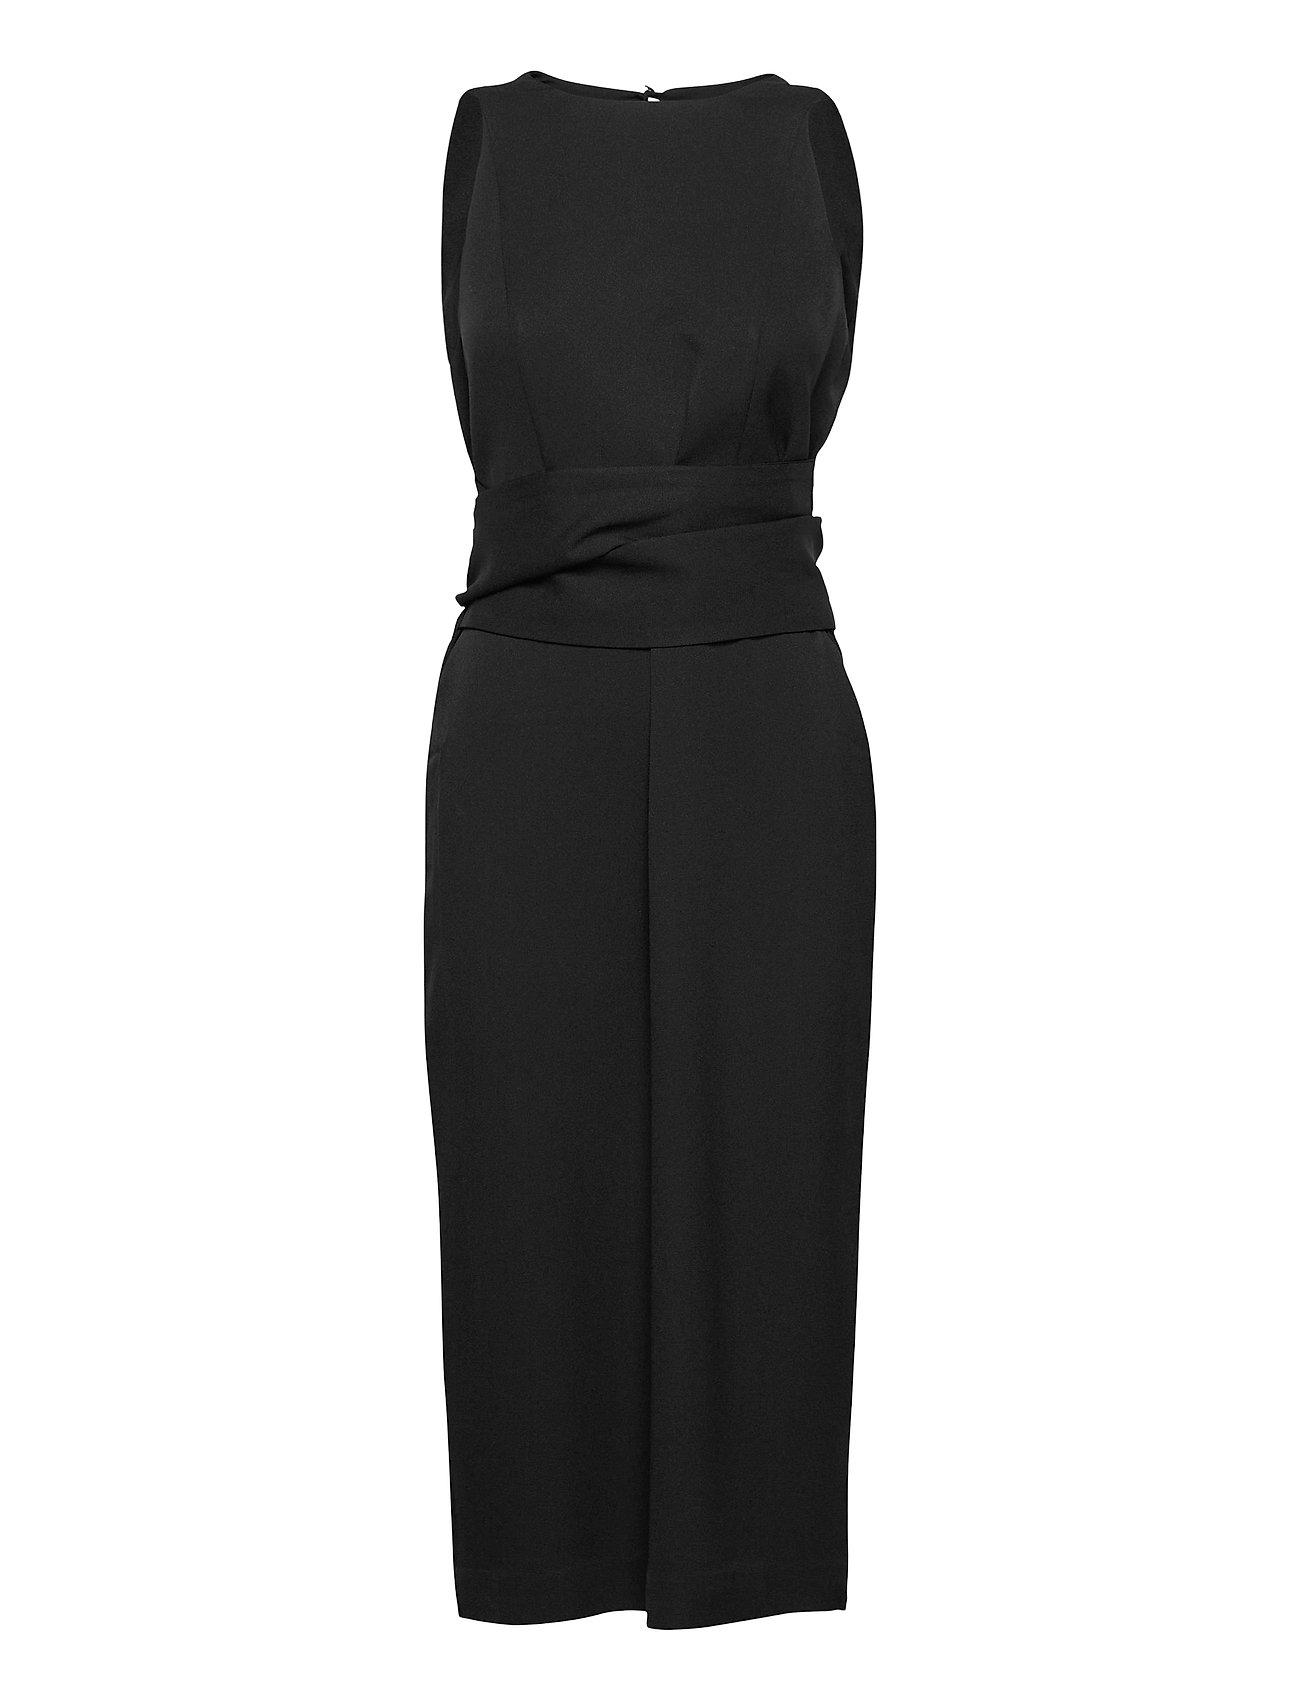 Image of Wrap Dress Midi Length Knælang Kjole Sort Ivy & Oak (3490040621)